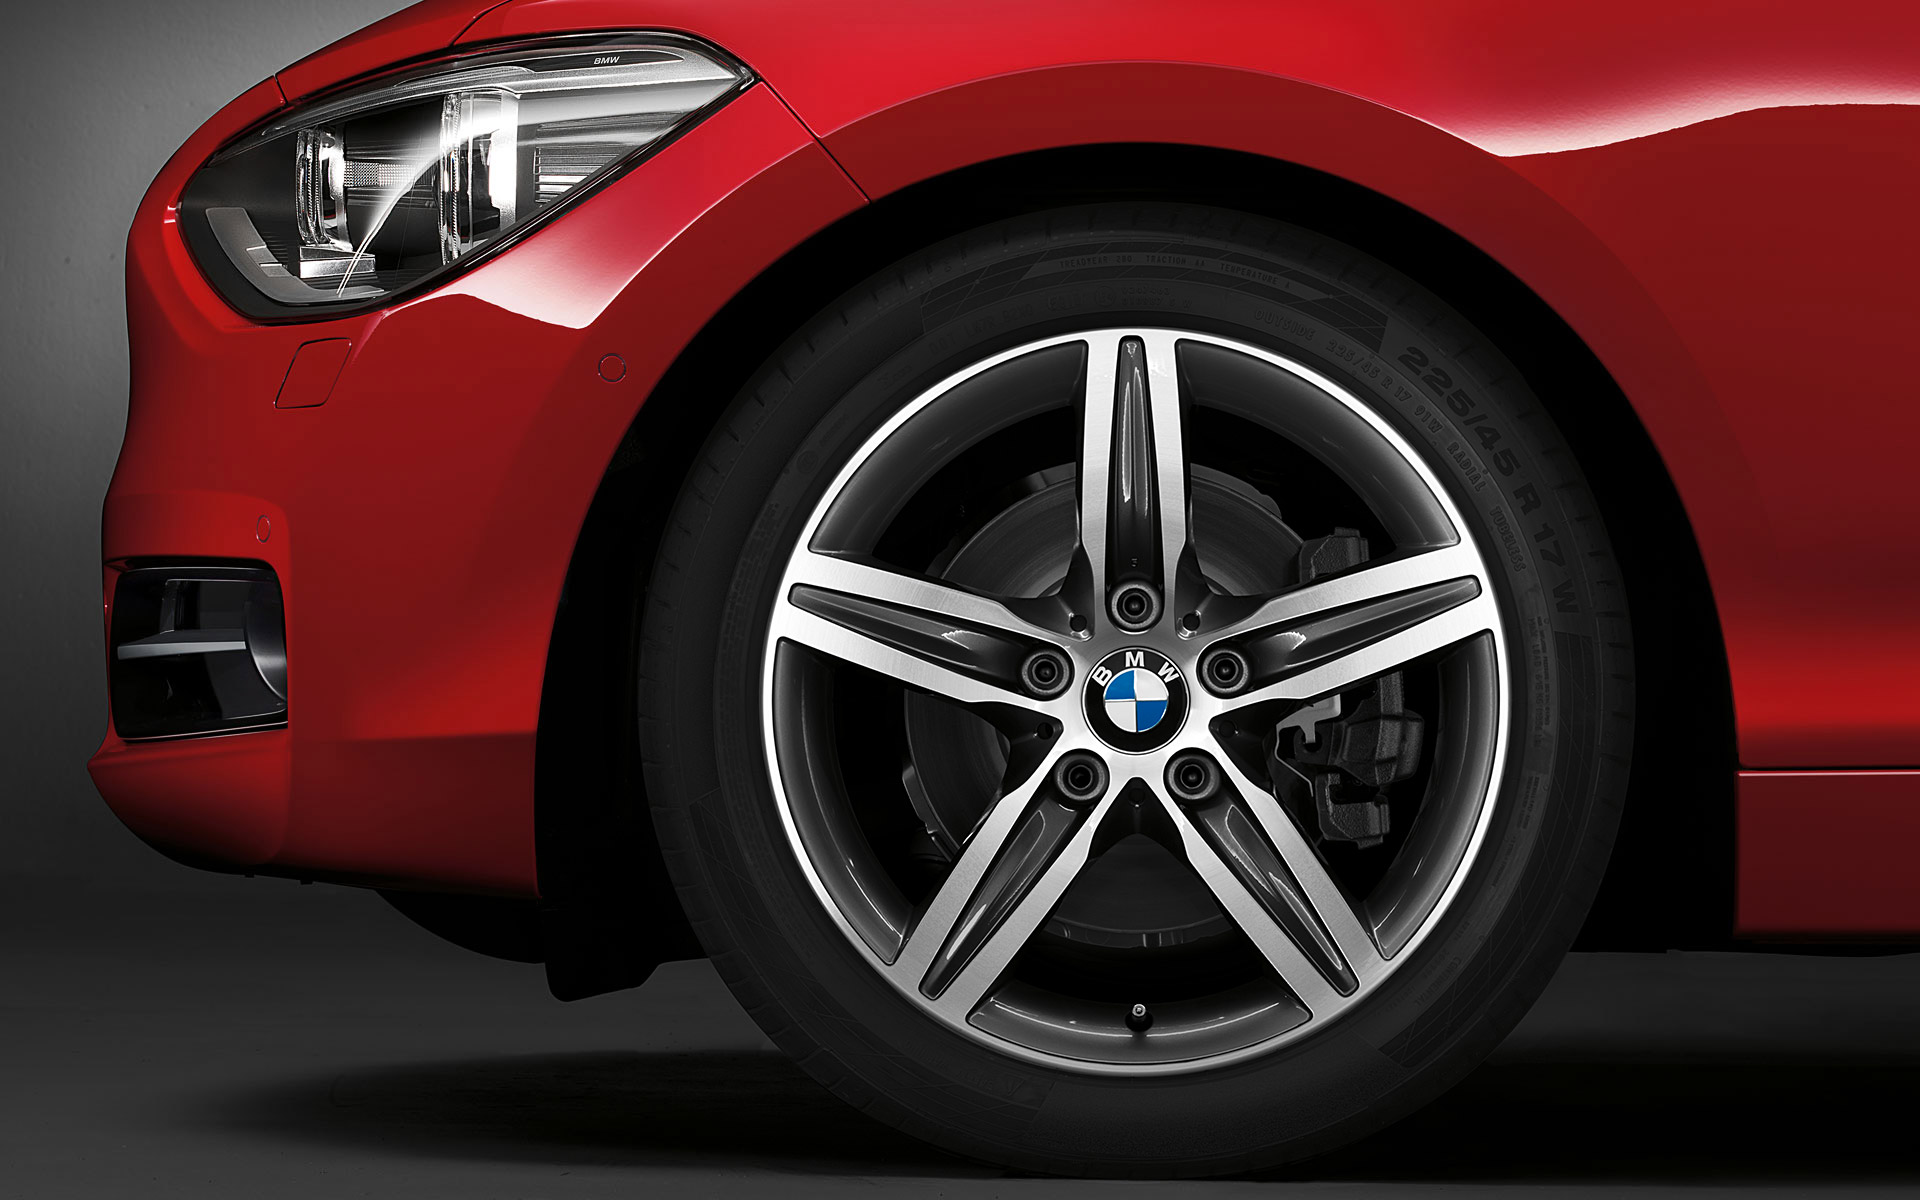 BMW_1series_wallpaper_13_1920_1200.jpg.resource.1375783654763.jpg